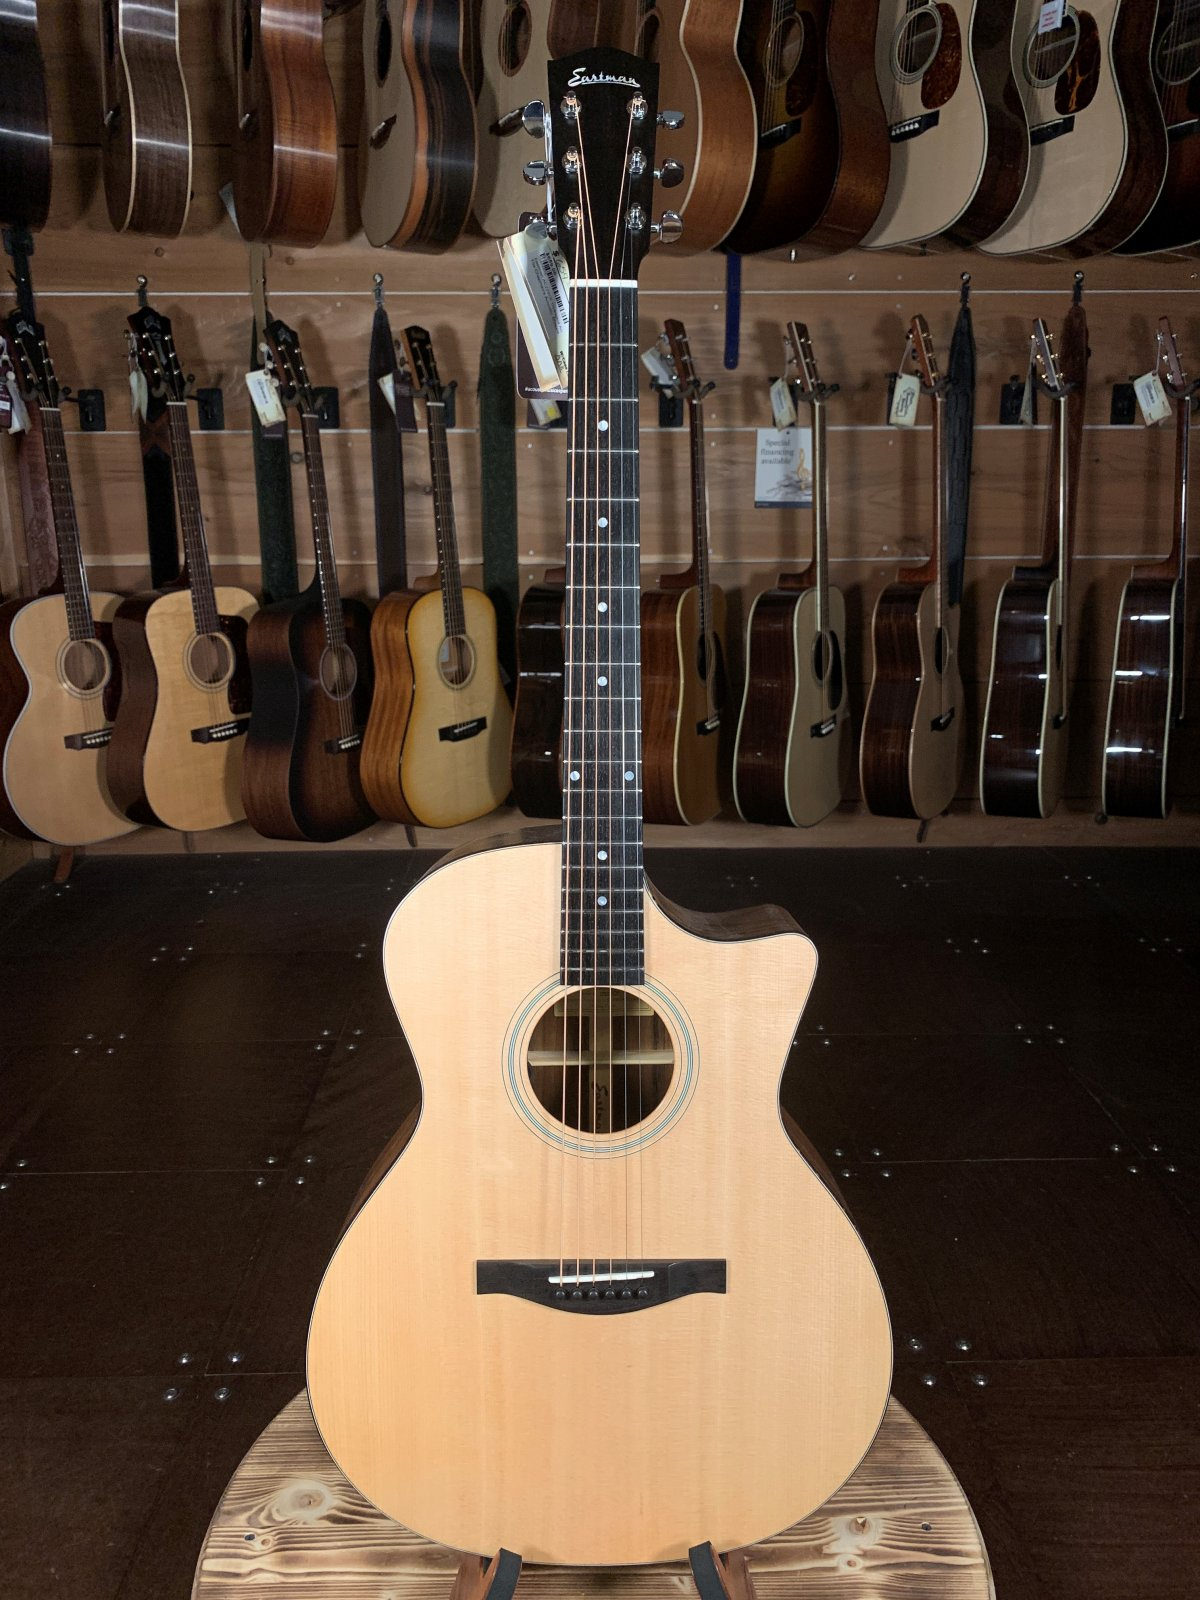 Eastman AC222CE Ovangkol Acoustic Guitar w/ Fishman Pickup #6875